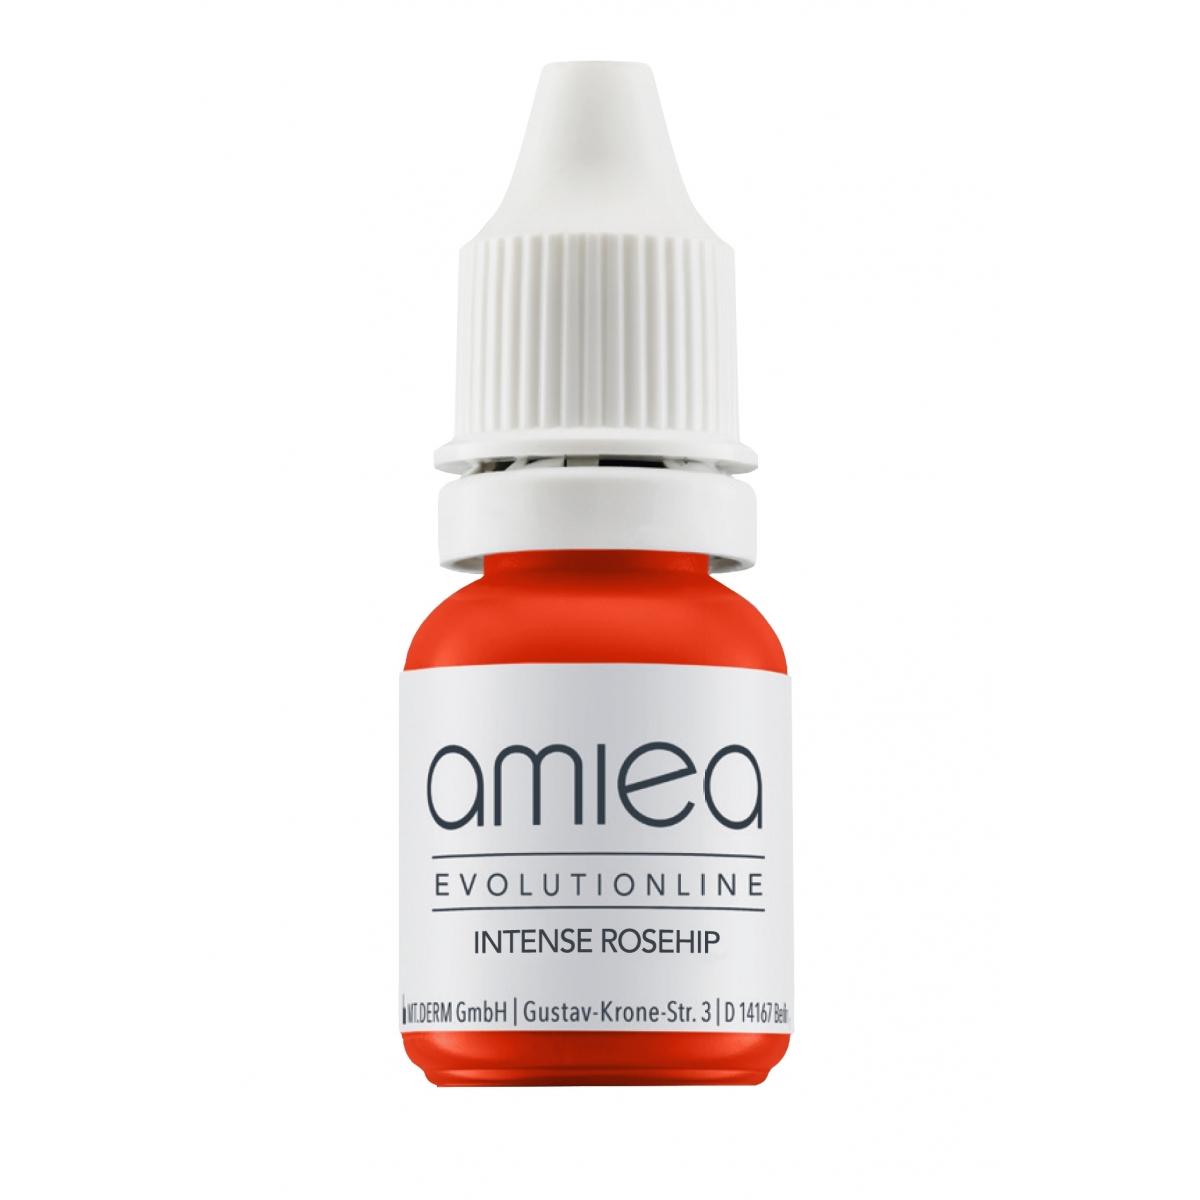 PIGMENTS AMIEA EVOLUTIONLINE INTENSE ROSEHIP, 5 ml